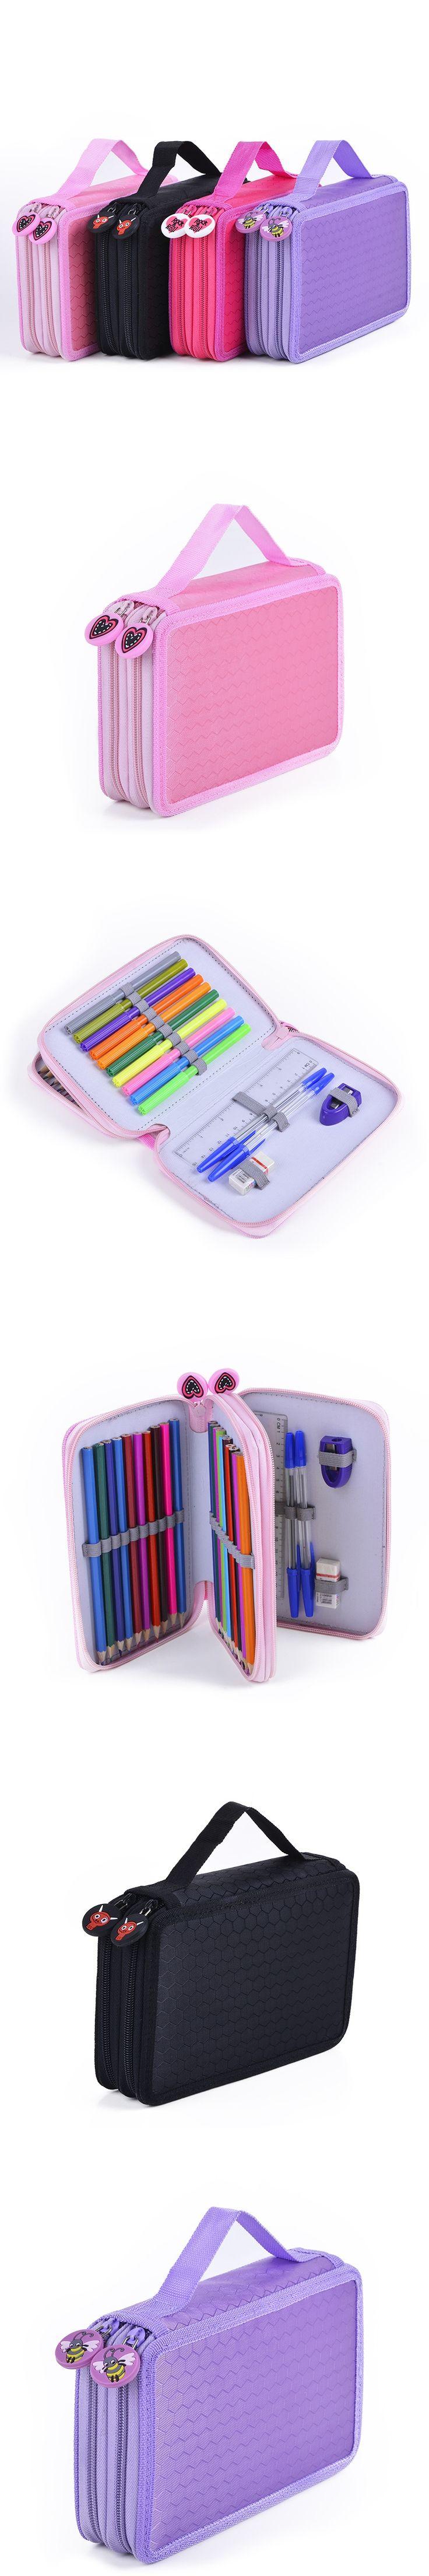 Sketch School Pencil Case Large Zipper Multilayer Hole Pencilcase Kids Boys  Girls Pen Bag Set Multifunction